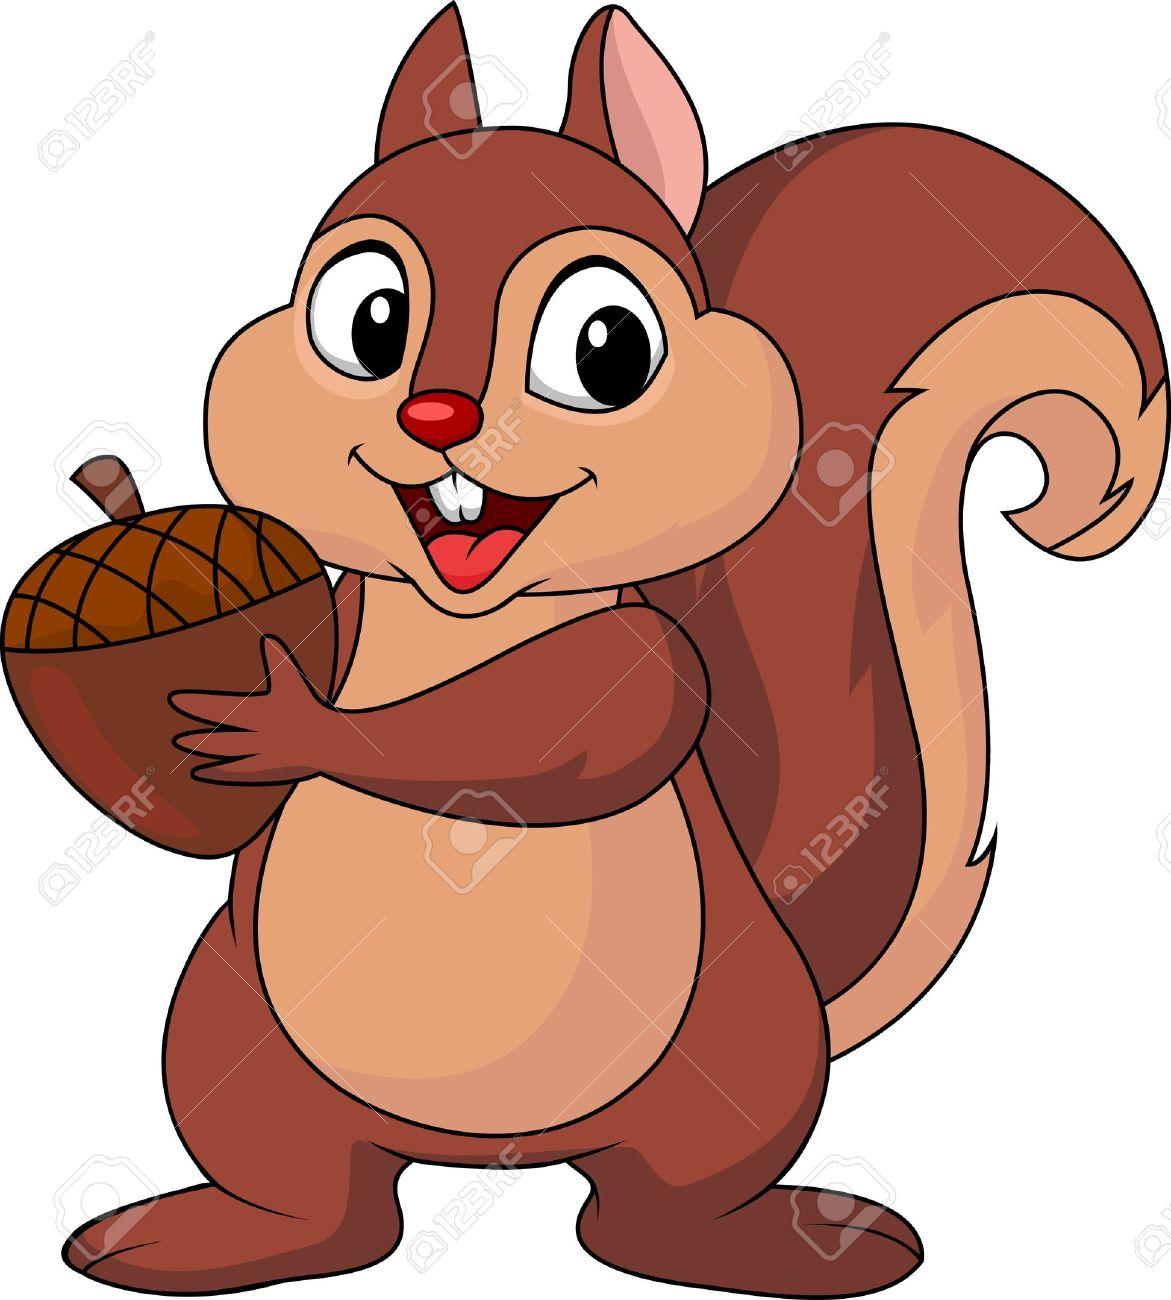 1171x1300 Cute Squirrel Clipart Cute Squirrel With Acorn Png Cartoon Clipart